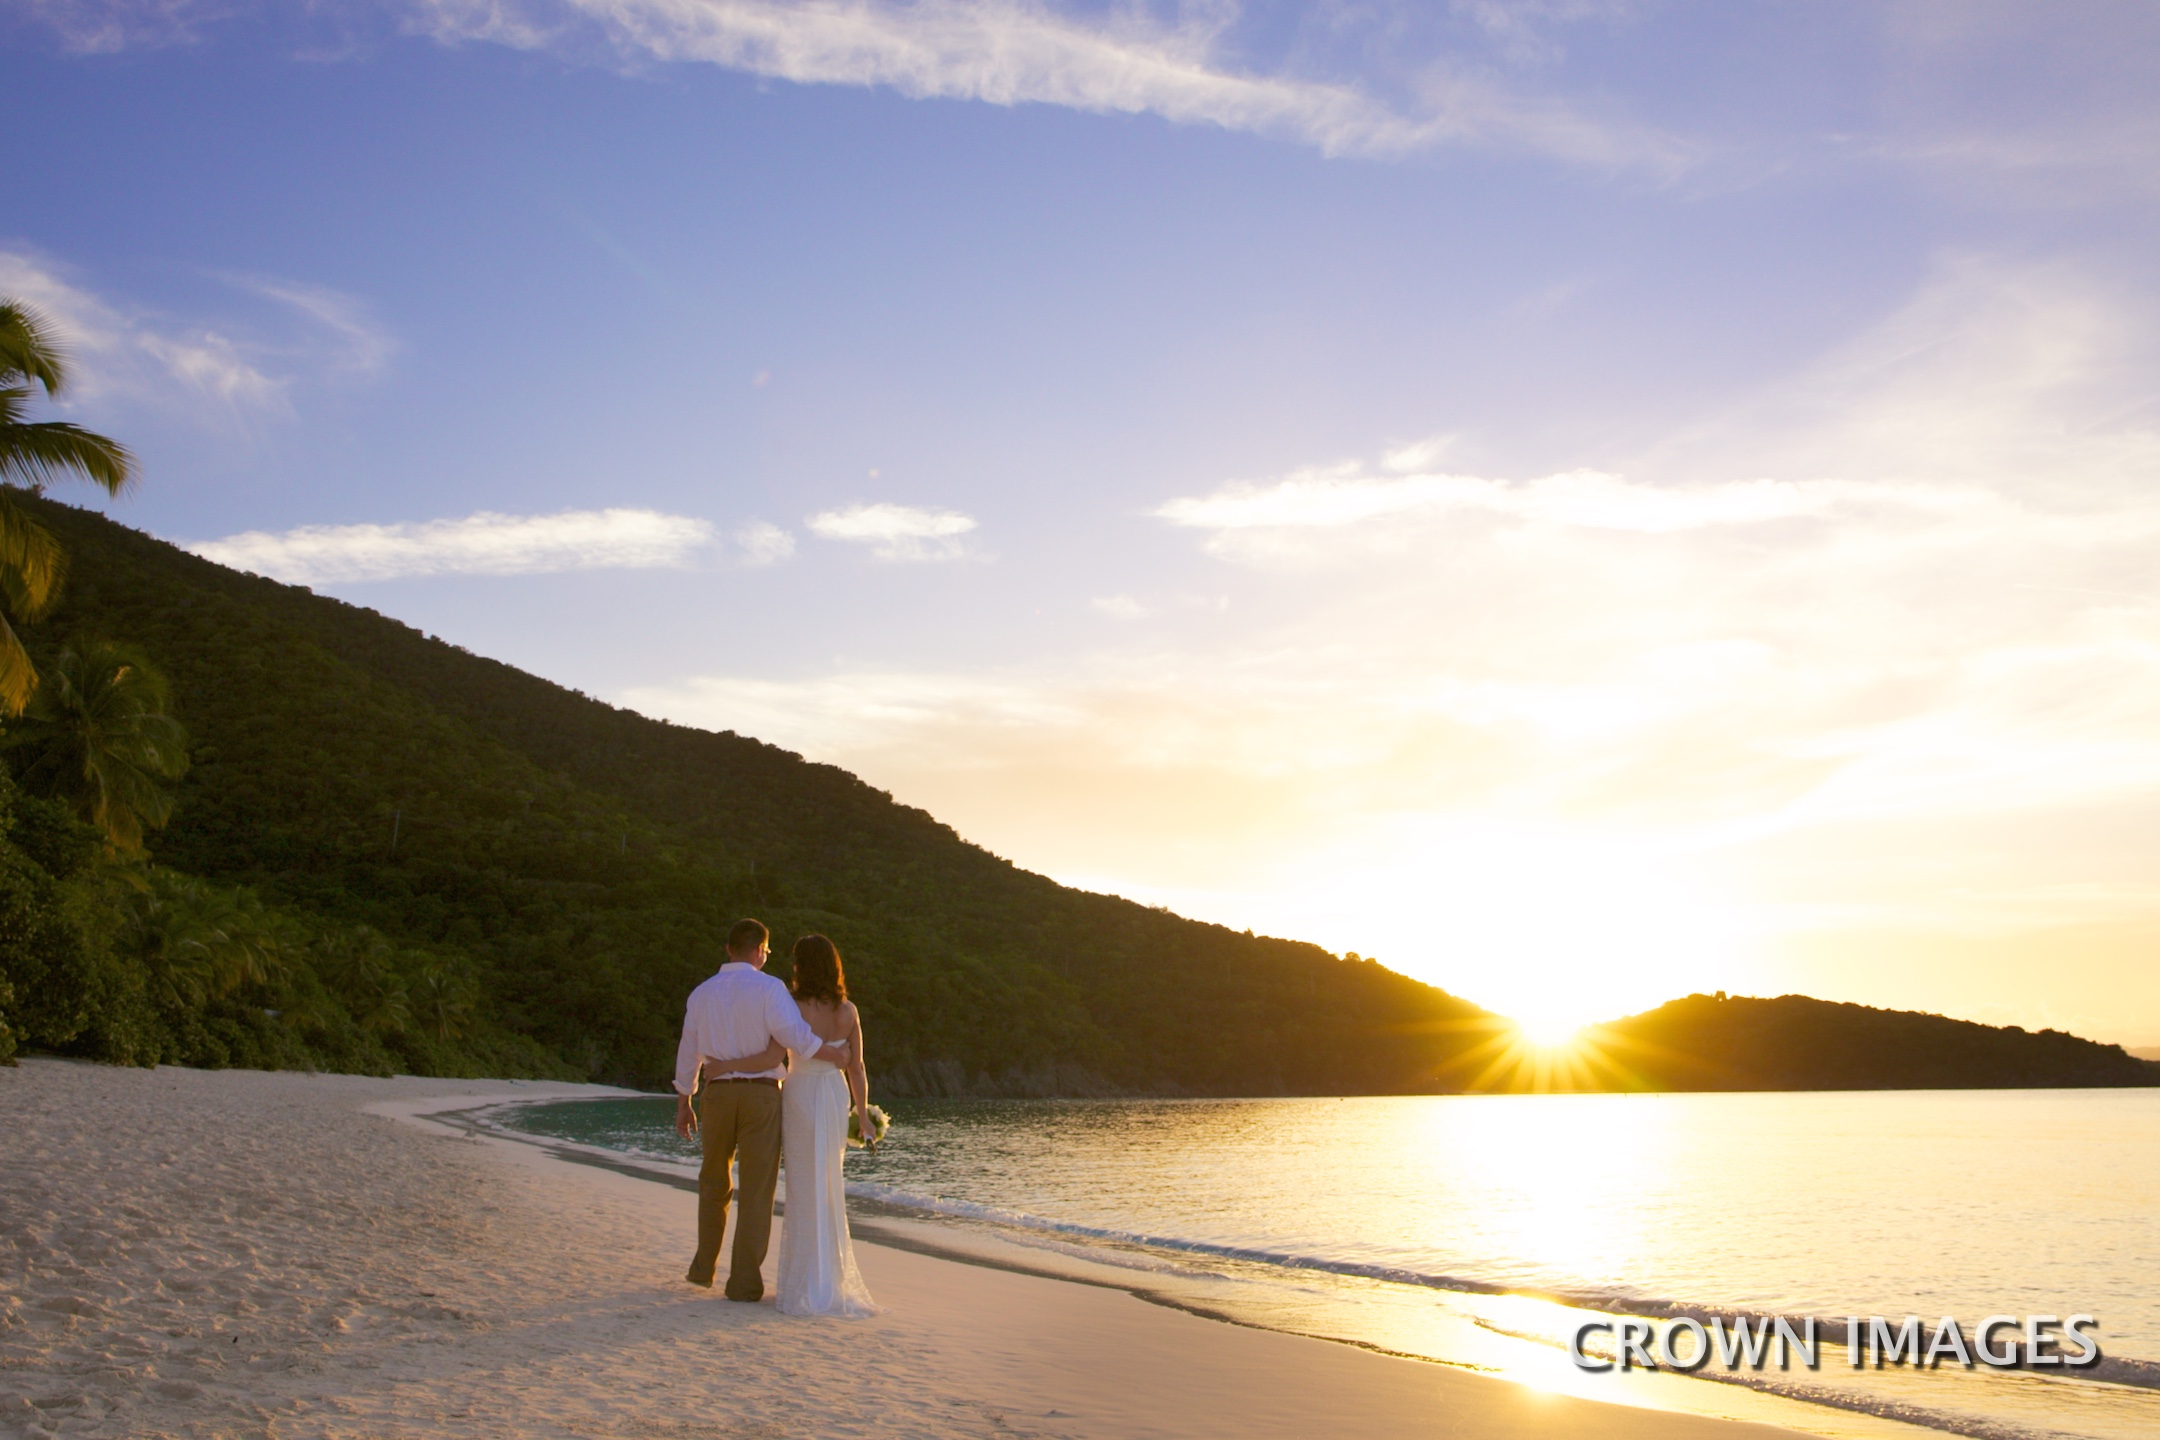 sunset wedding photos on st john in the virgin islands